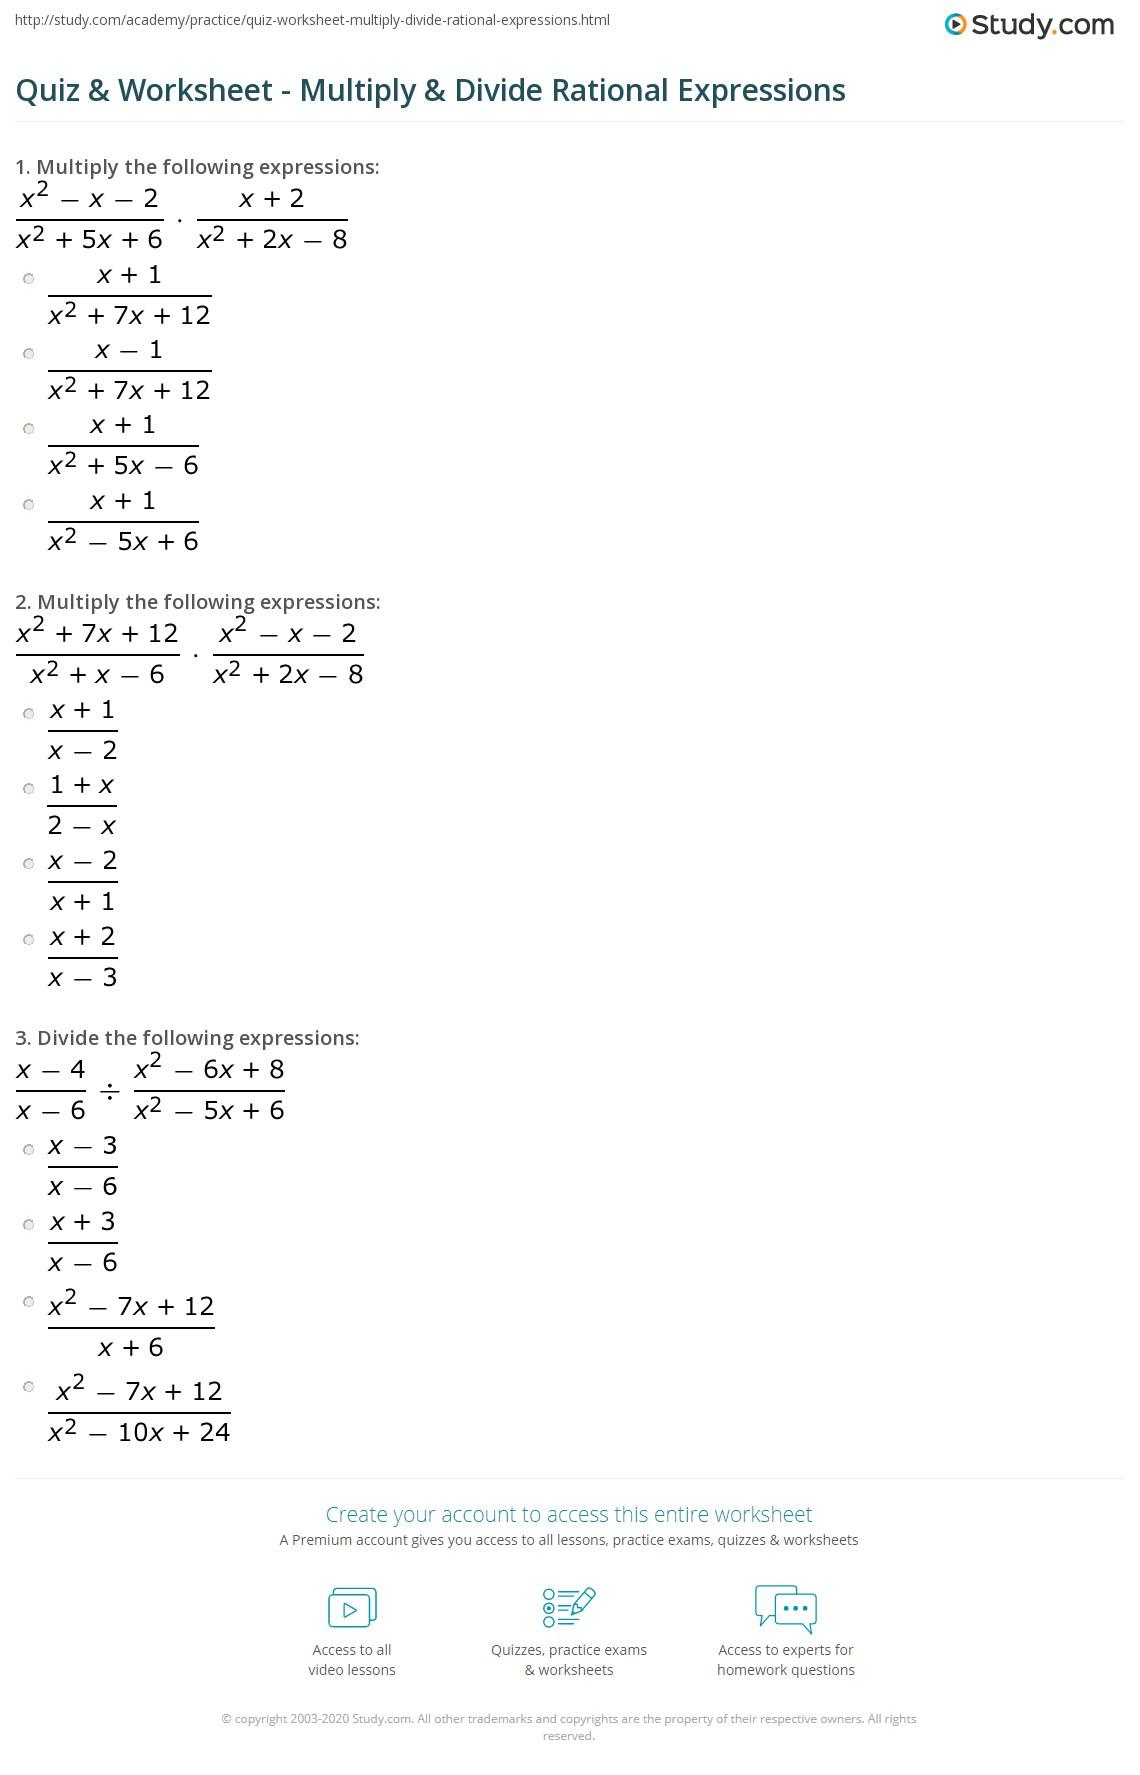 hight resolution of Quiz \u0026 Worksheet - Multiply \u0026 Divide Rational Expressions   Study.com